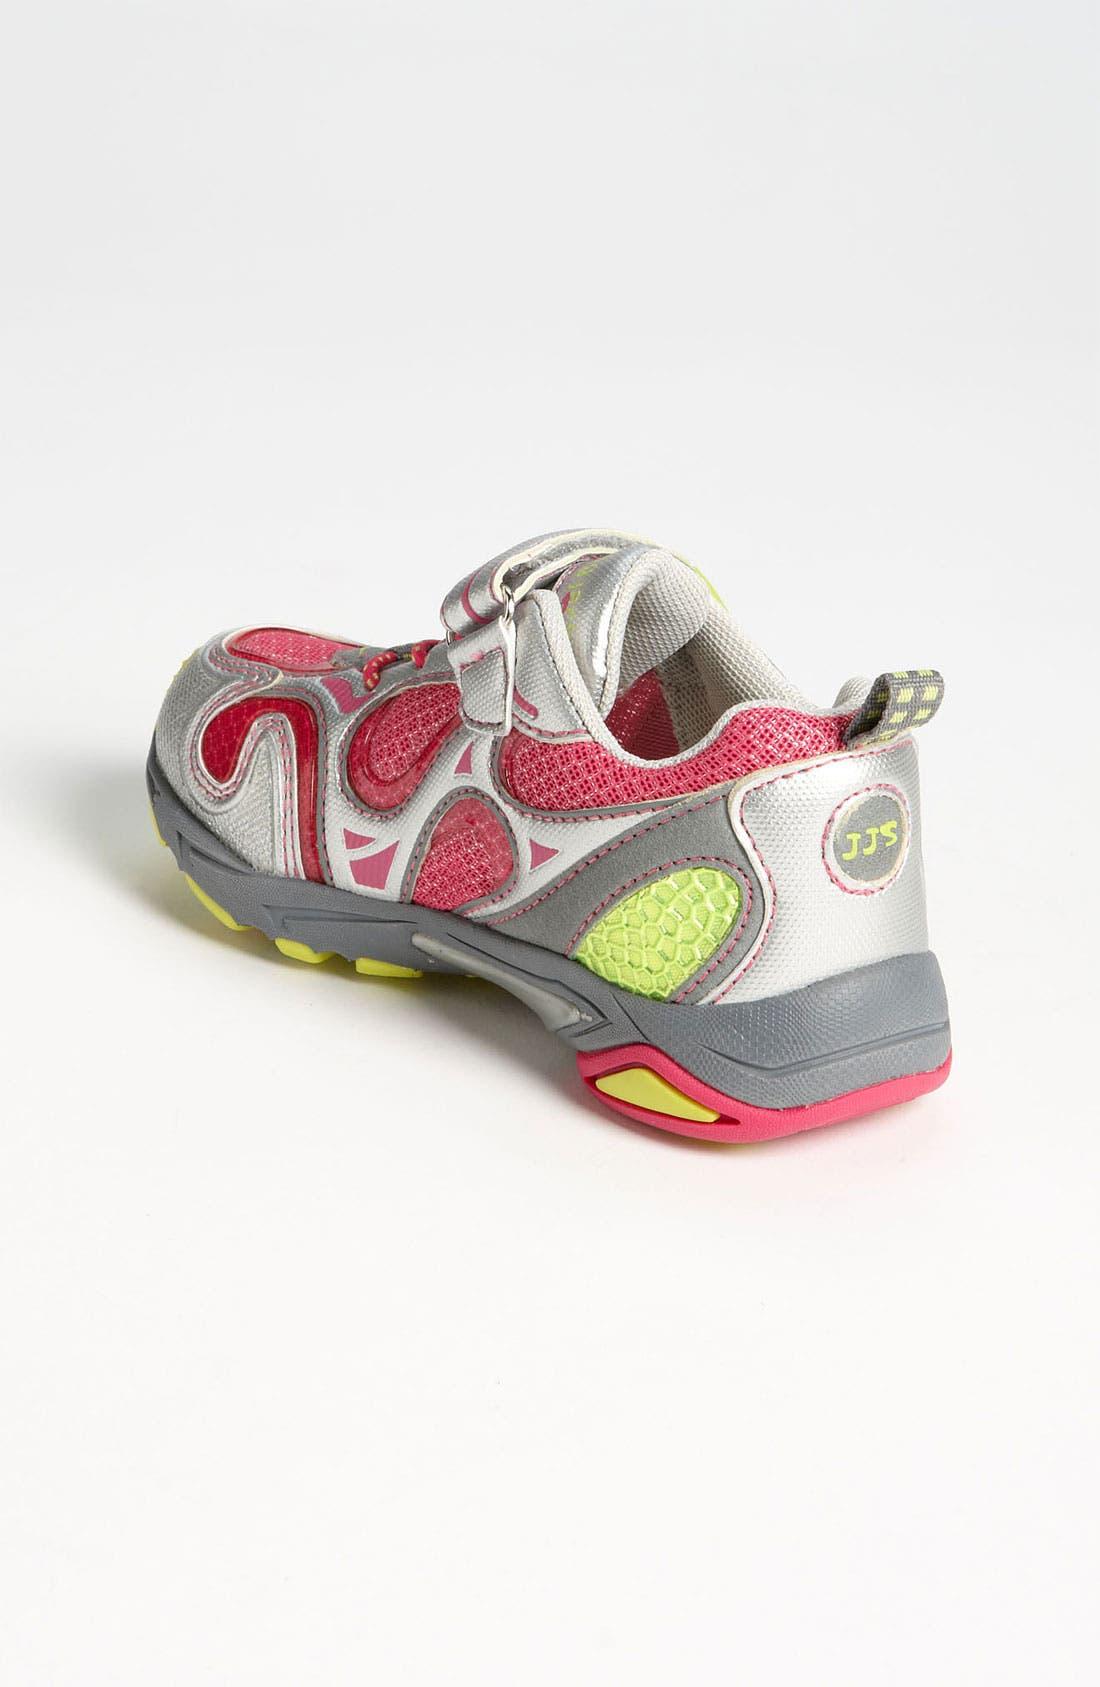 Alternate Image 2  - Jumping Jacks 'Turtle Tuff' Sneaker (Toddler, Little Kid & Big Kid)